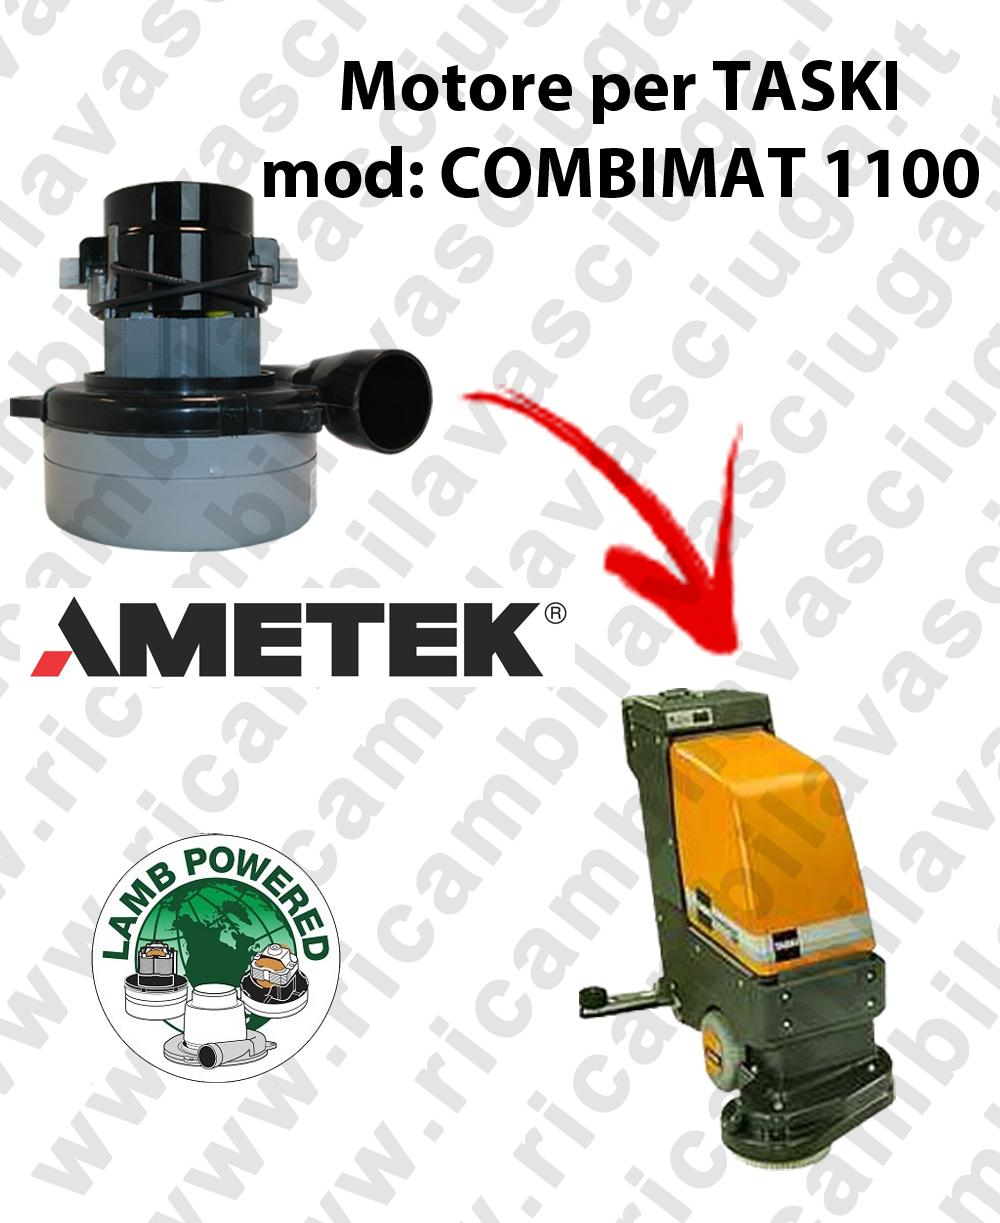 COMBIMAT 1100 MOTORE LAMB AMETEK di aspirazione per lavapavimenti TASKI